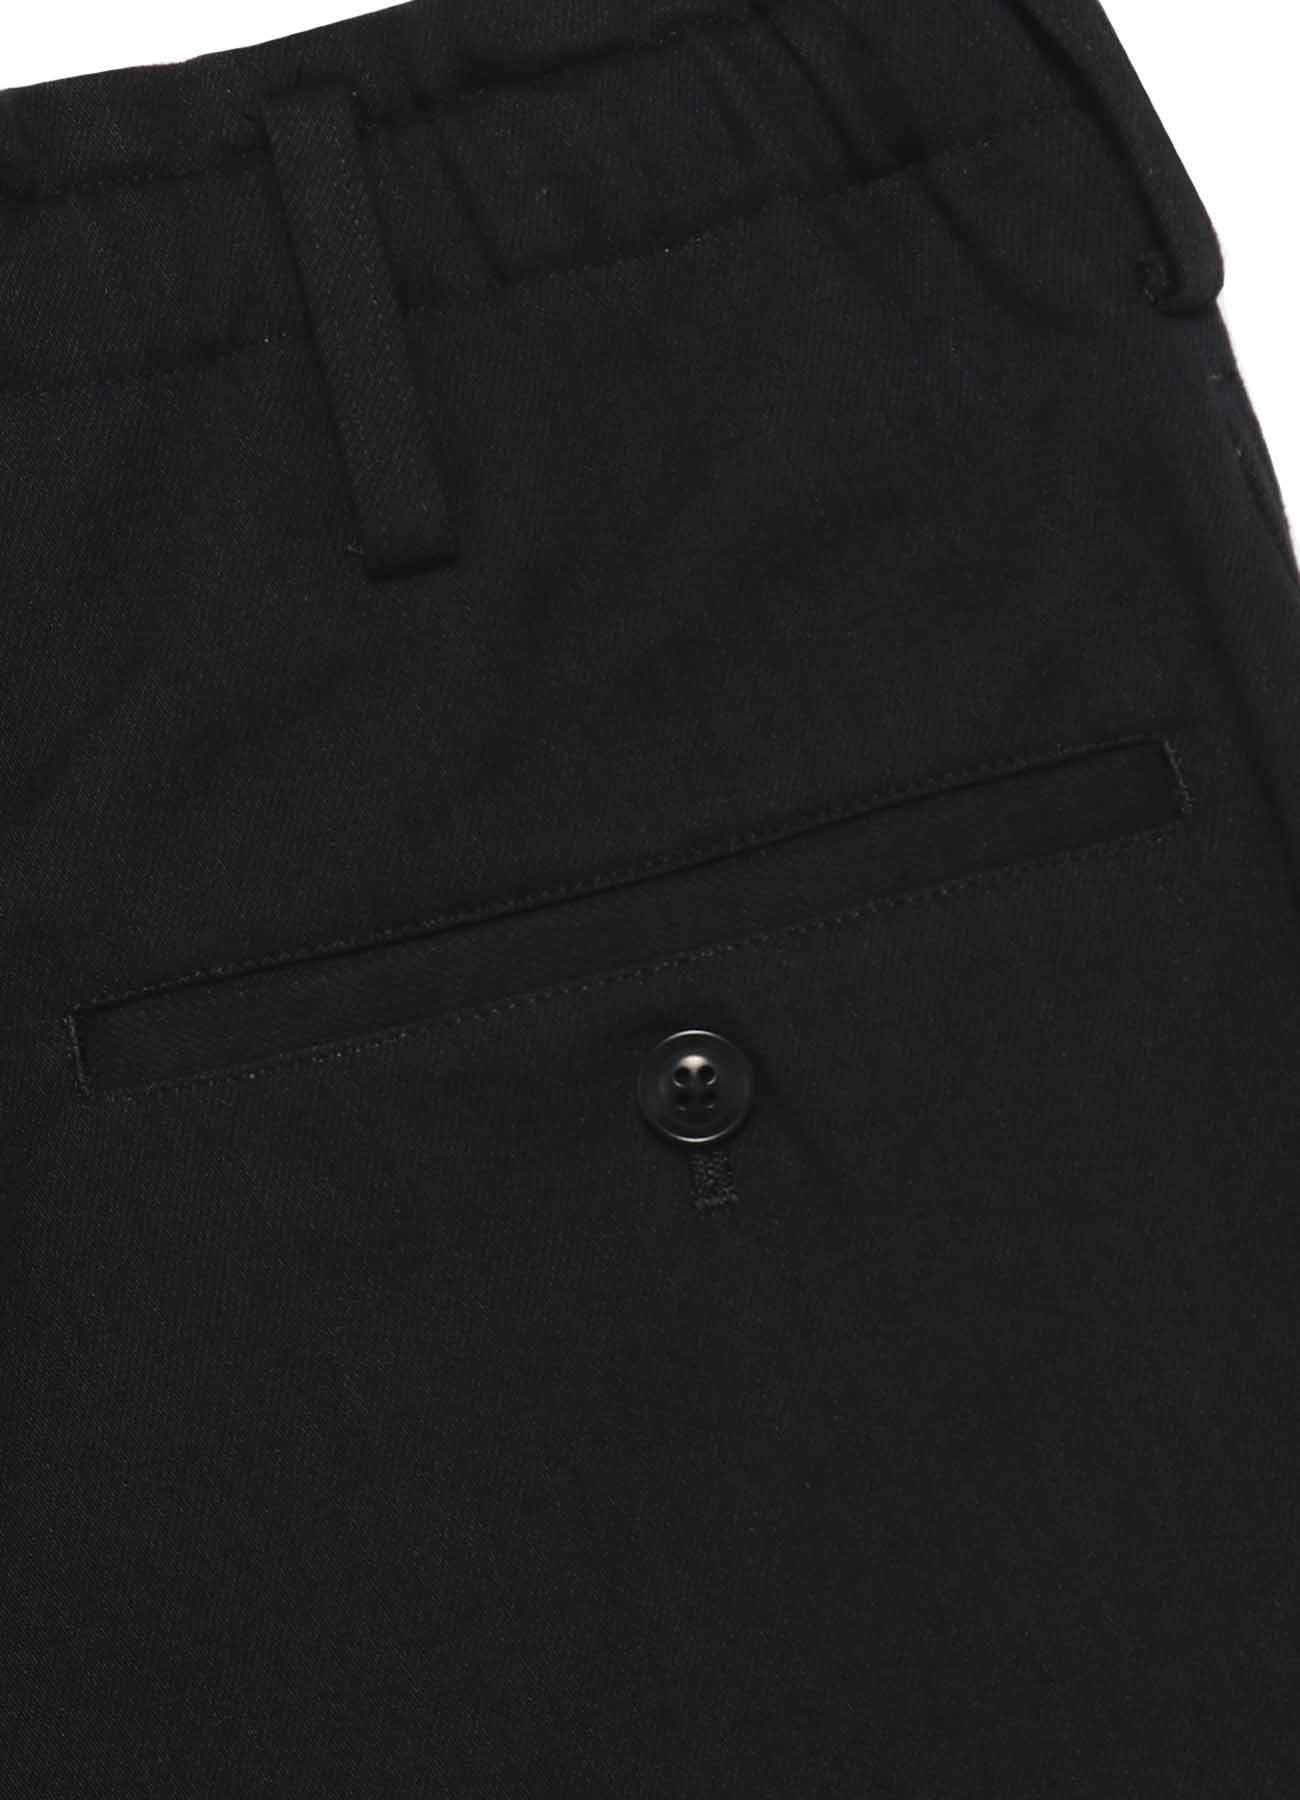 Y's BANG ON!No.97 Pleats sarouel-Pants Black denim